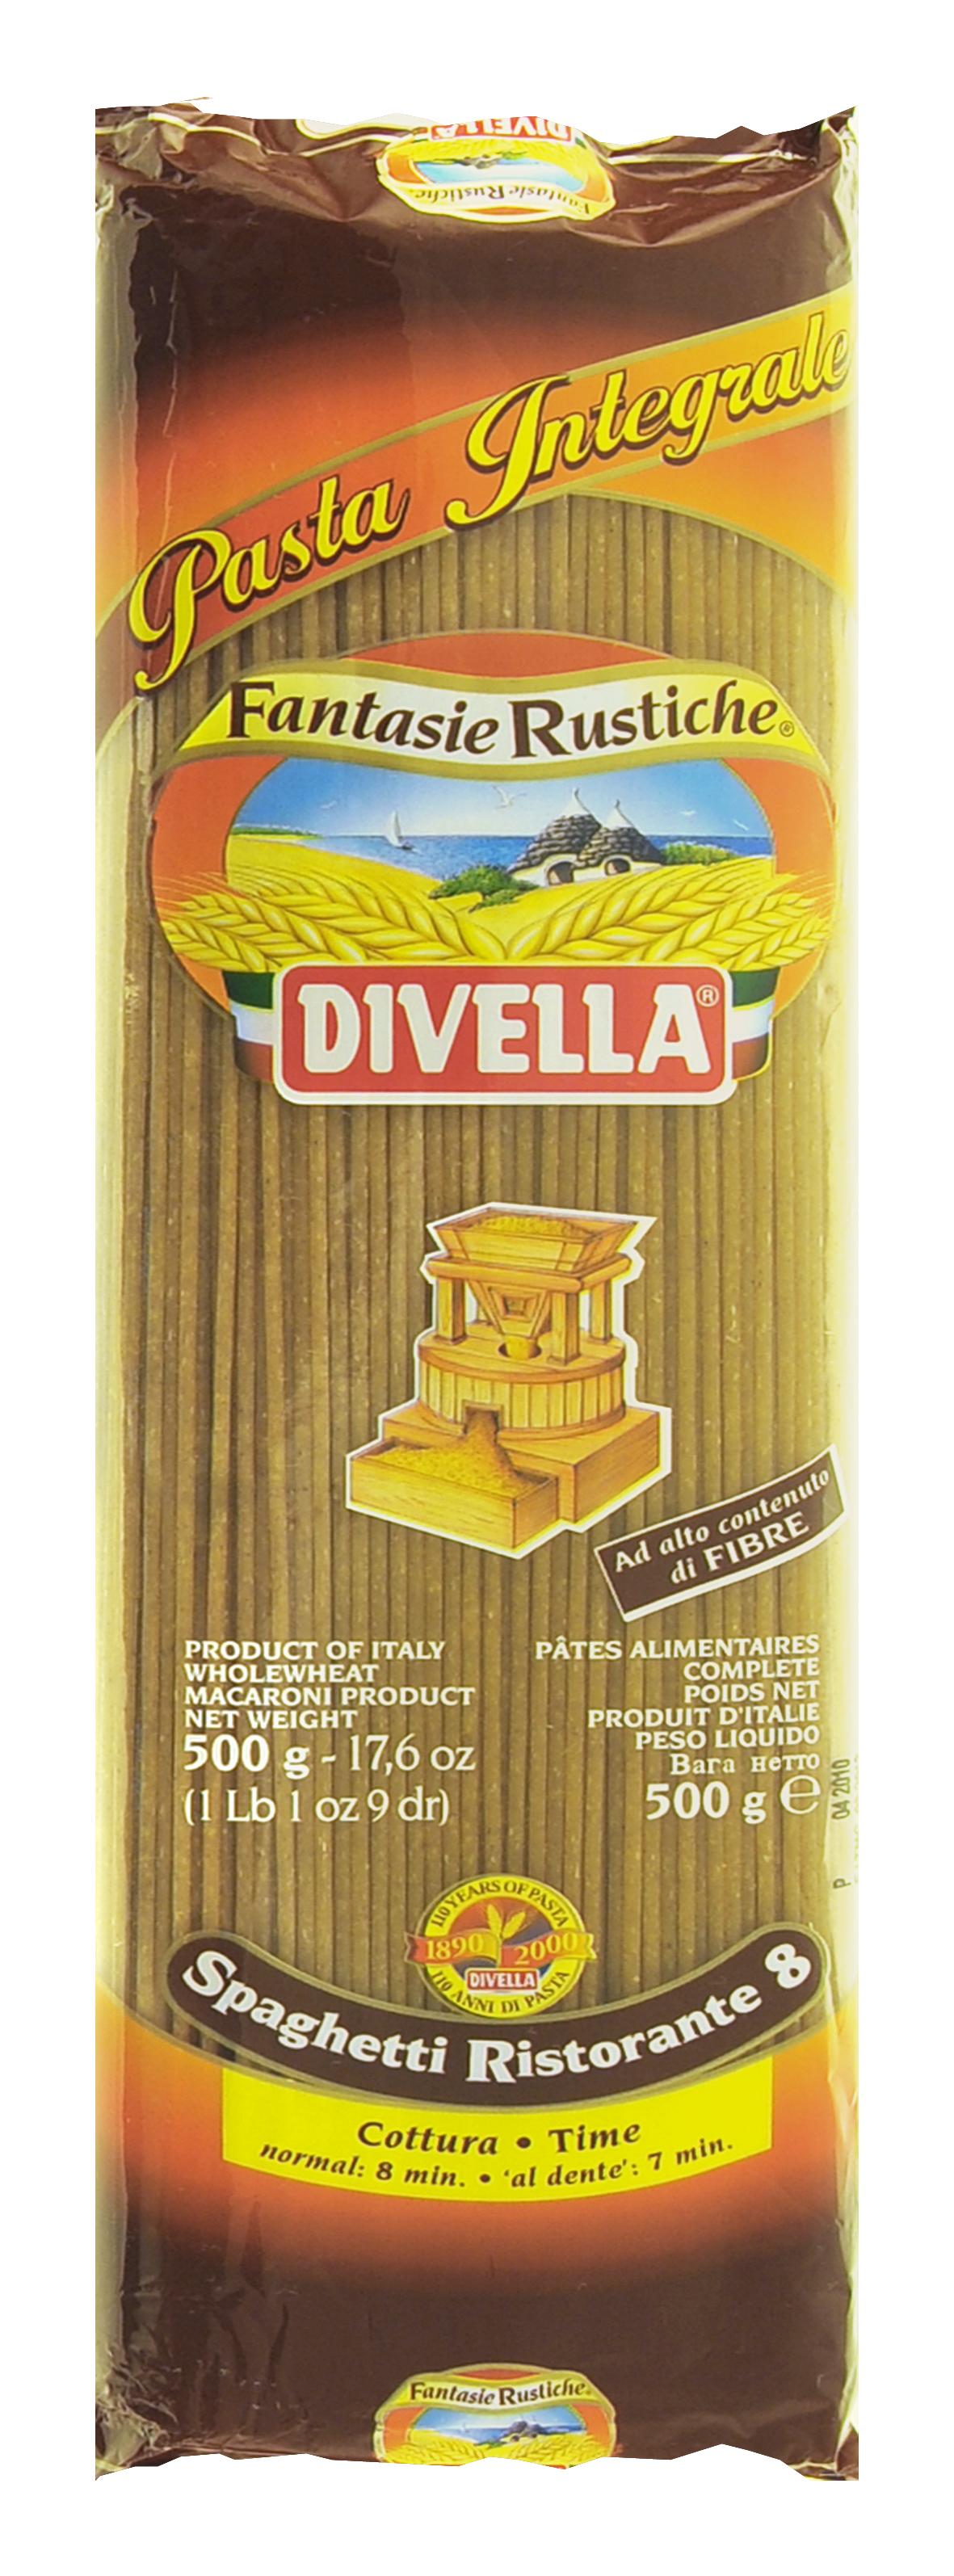 Divella pełnoziarnisty makaron spaghetti